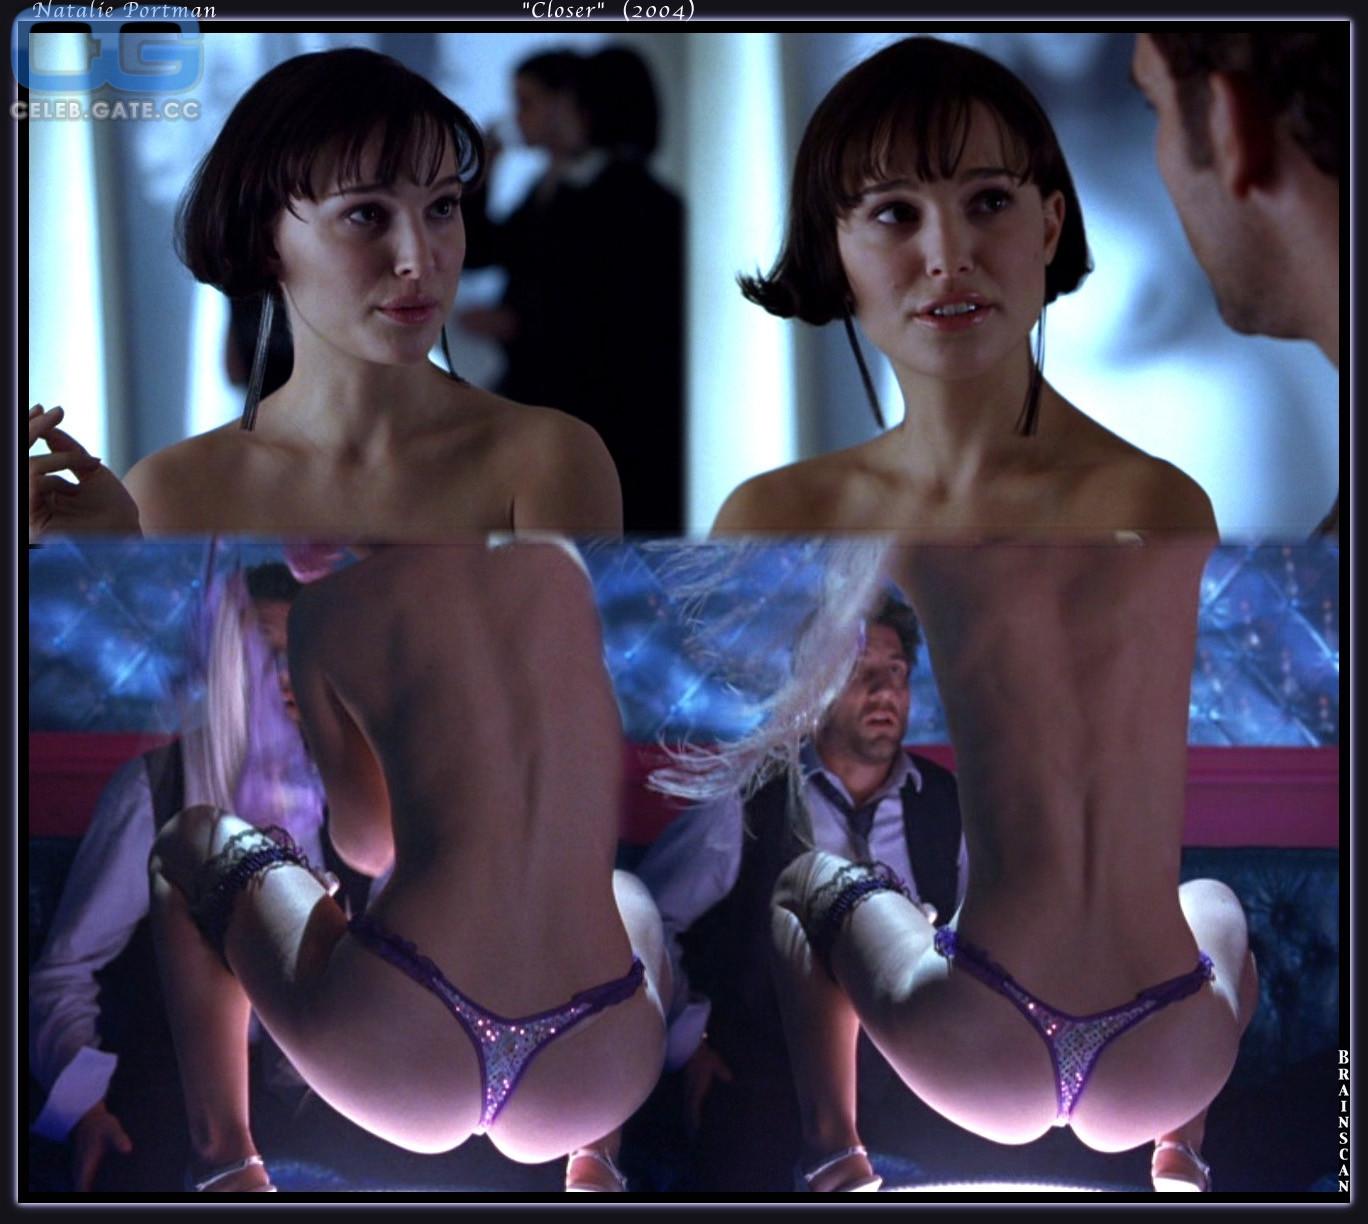 Portmann nude natalie Natalie Portman